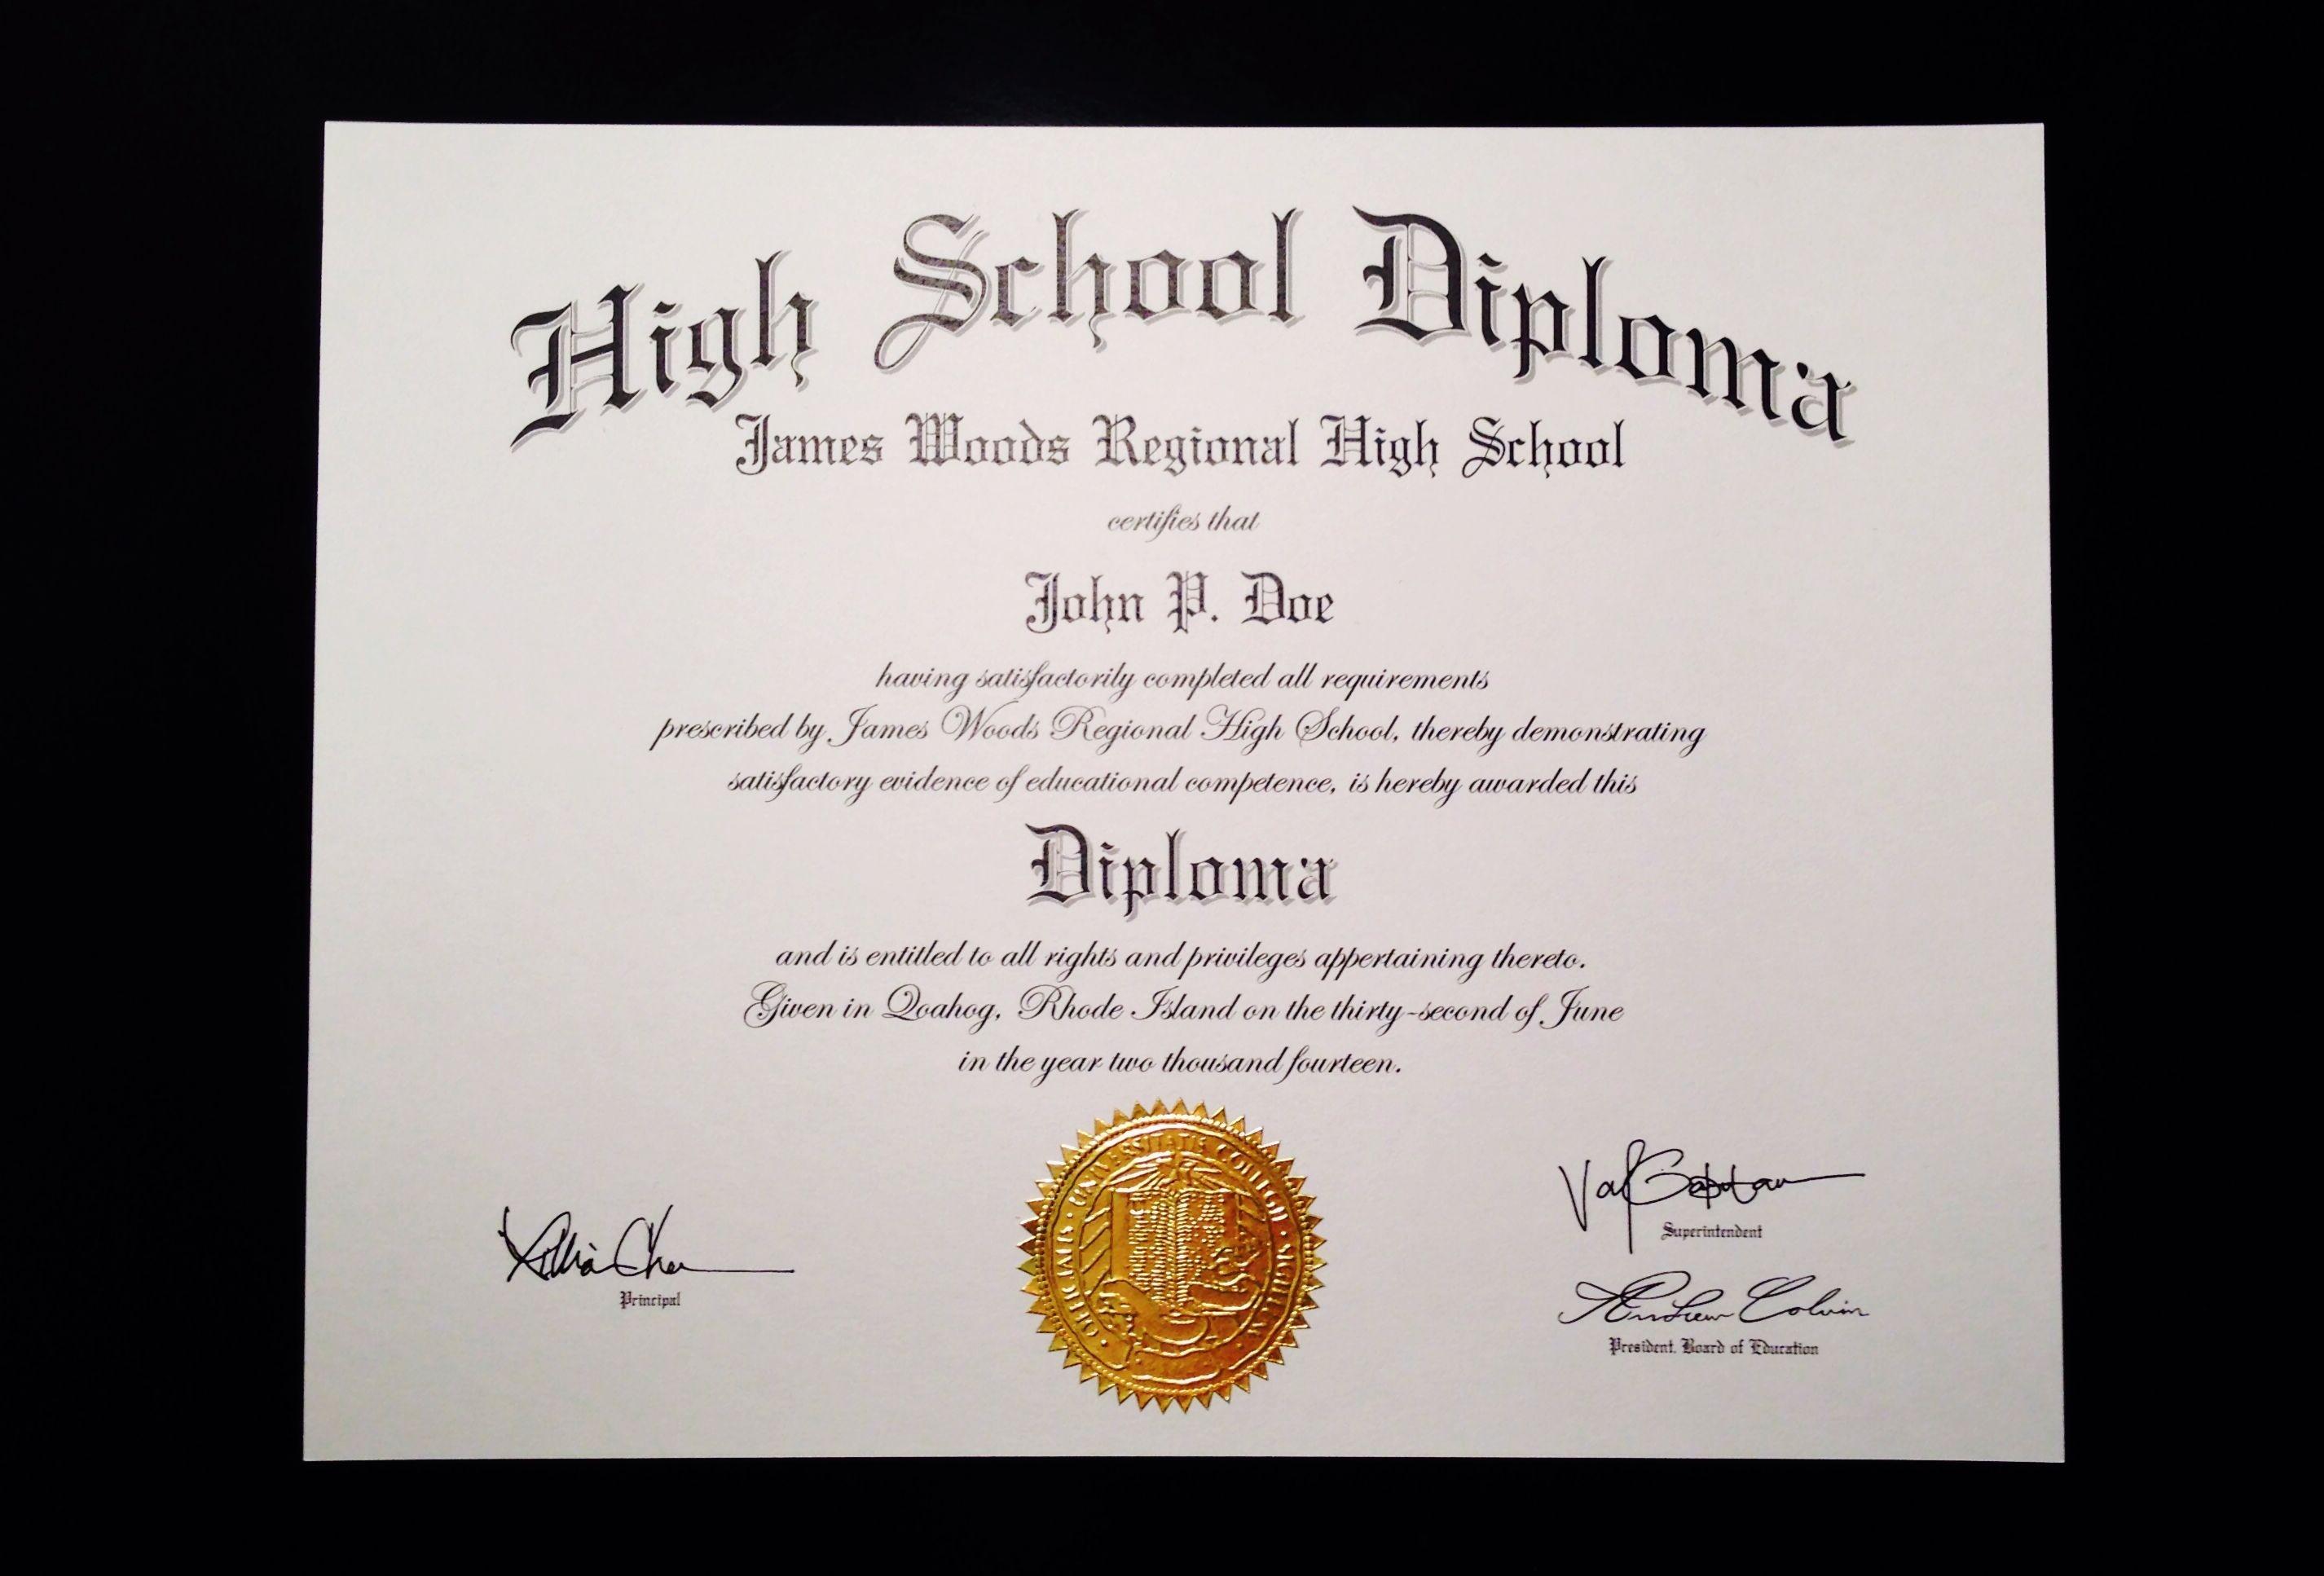 School Certificate Template Free Printable Certificates | Diploma - Free Printable Diploma Template